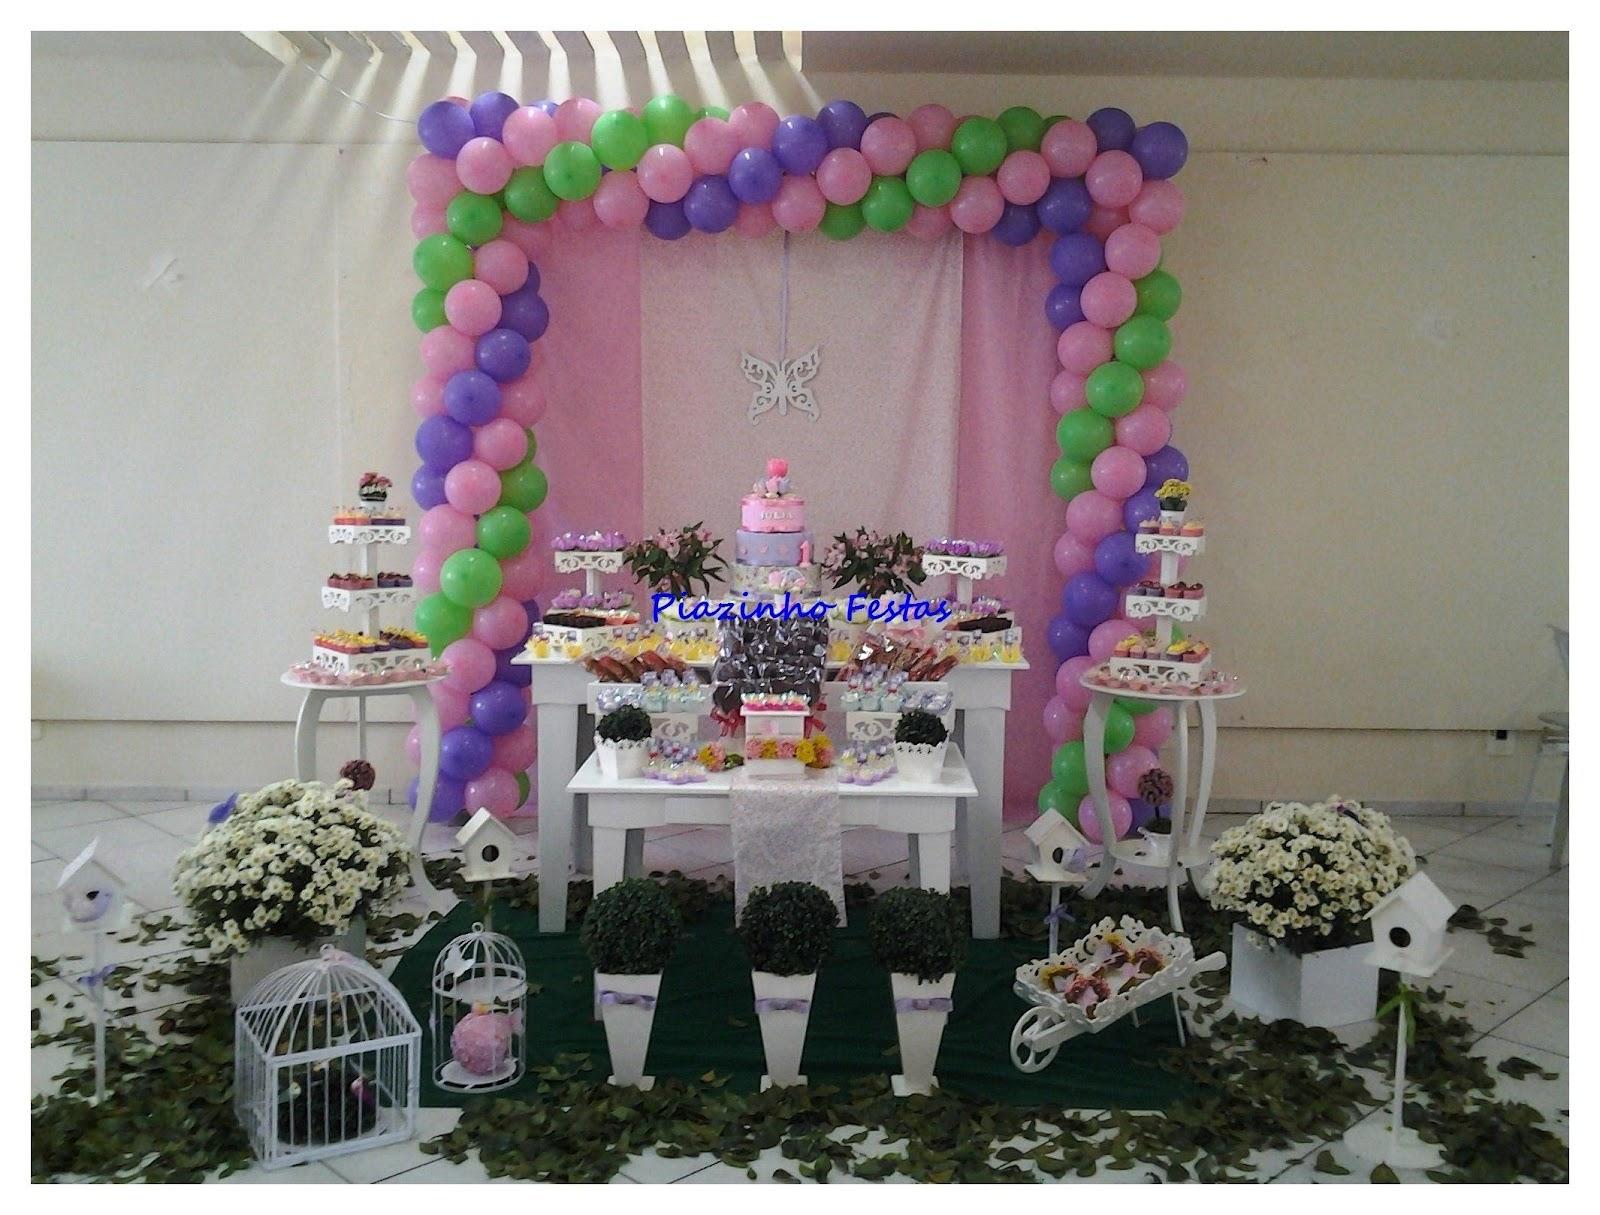 Festa Infantil por Rozangela Mazur